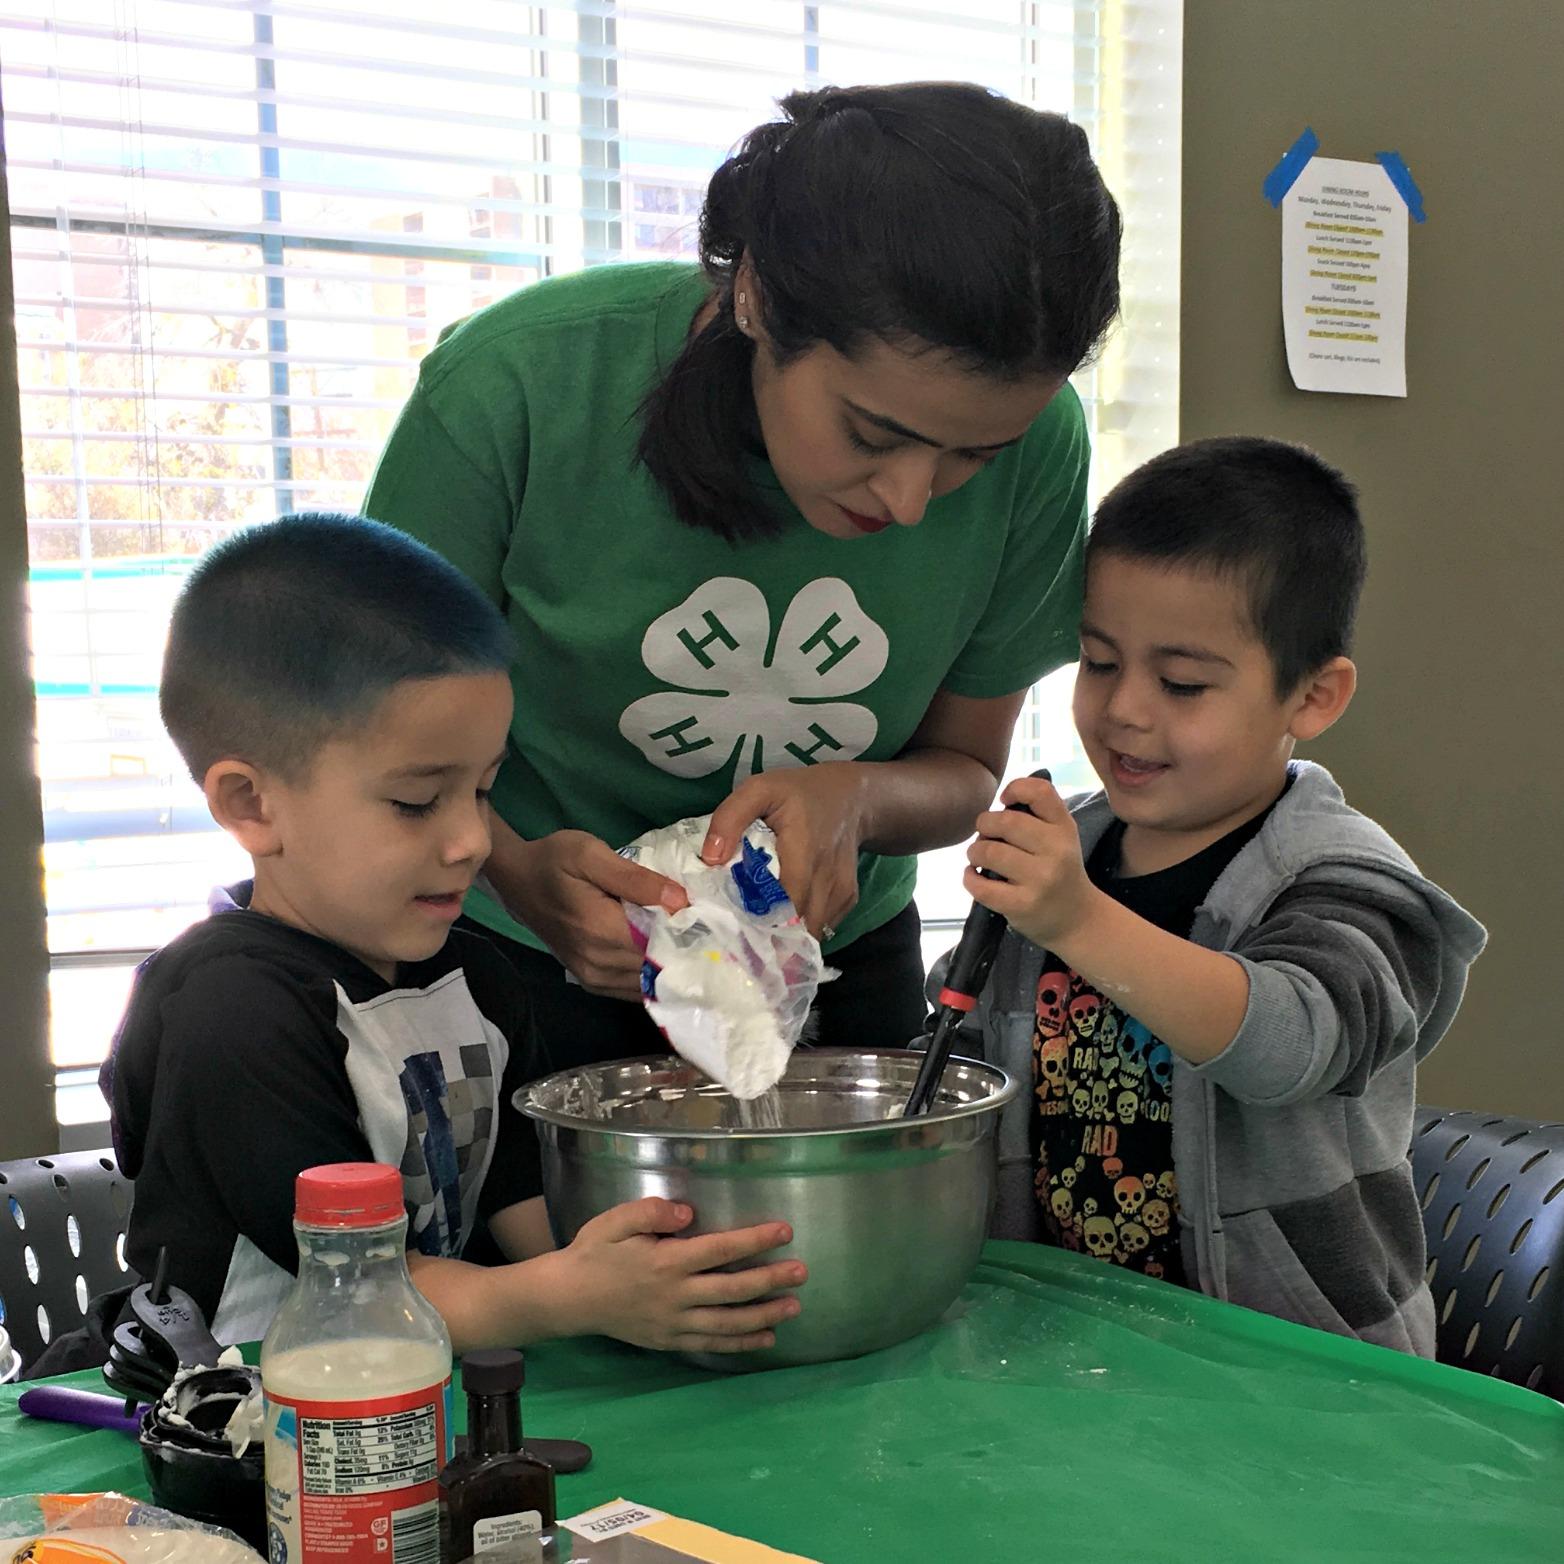 Denver 4-H's Cake Decorating Program at The Gathering Place